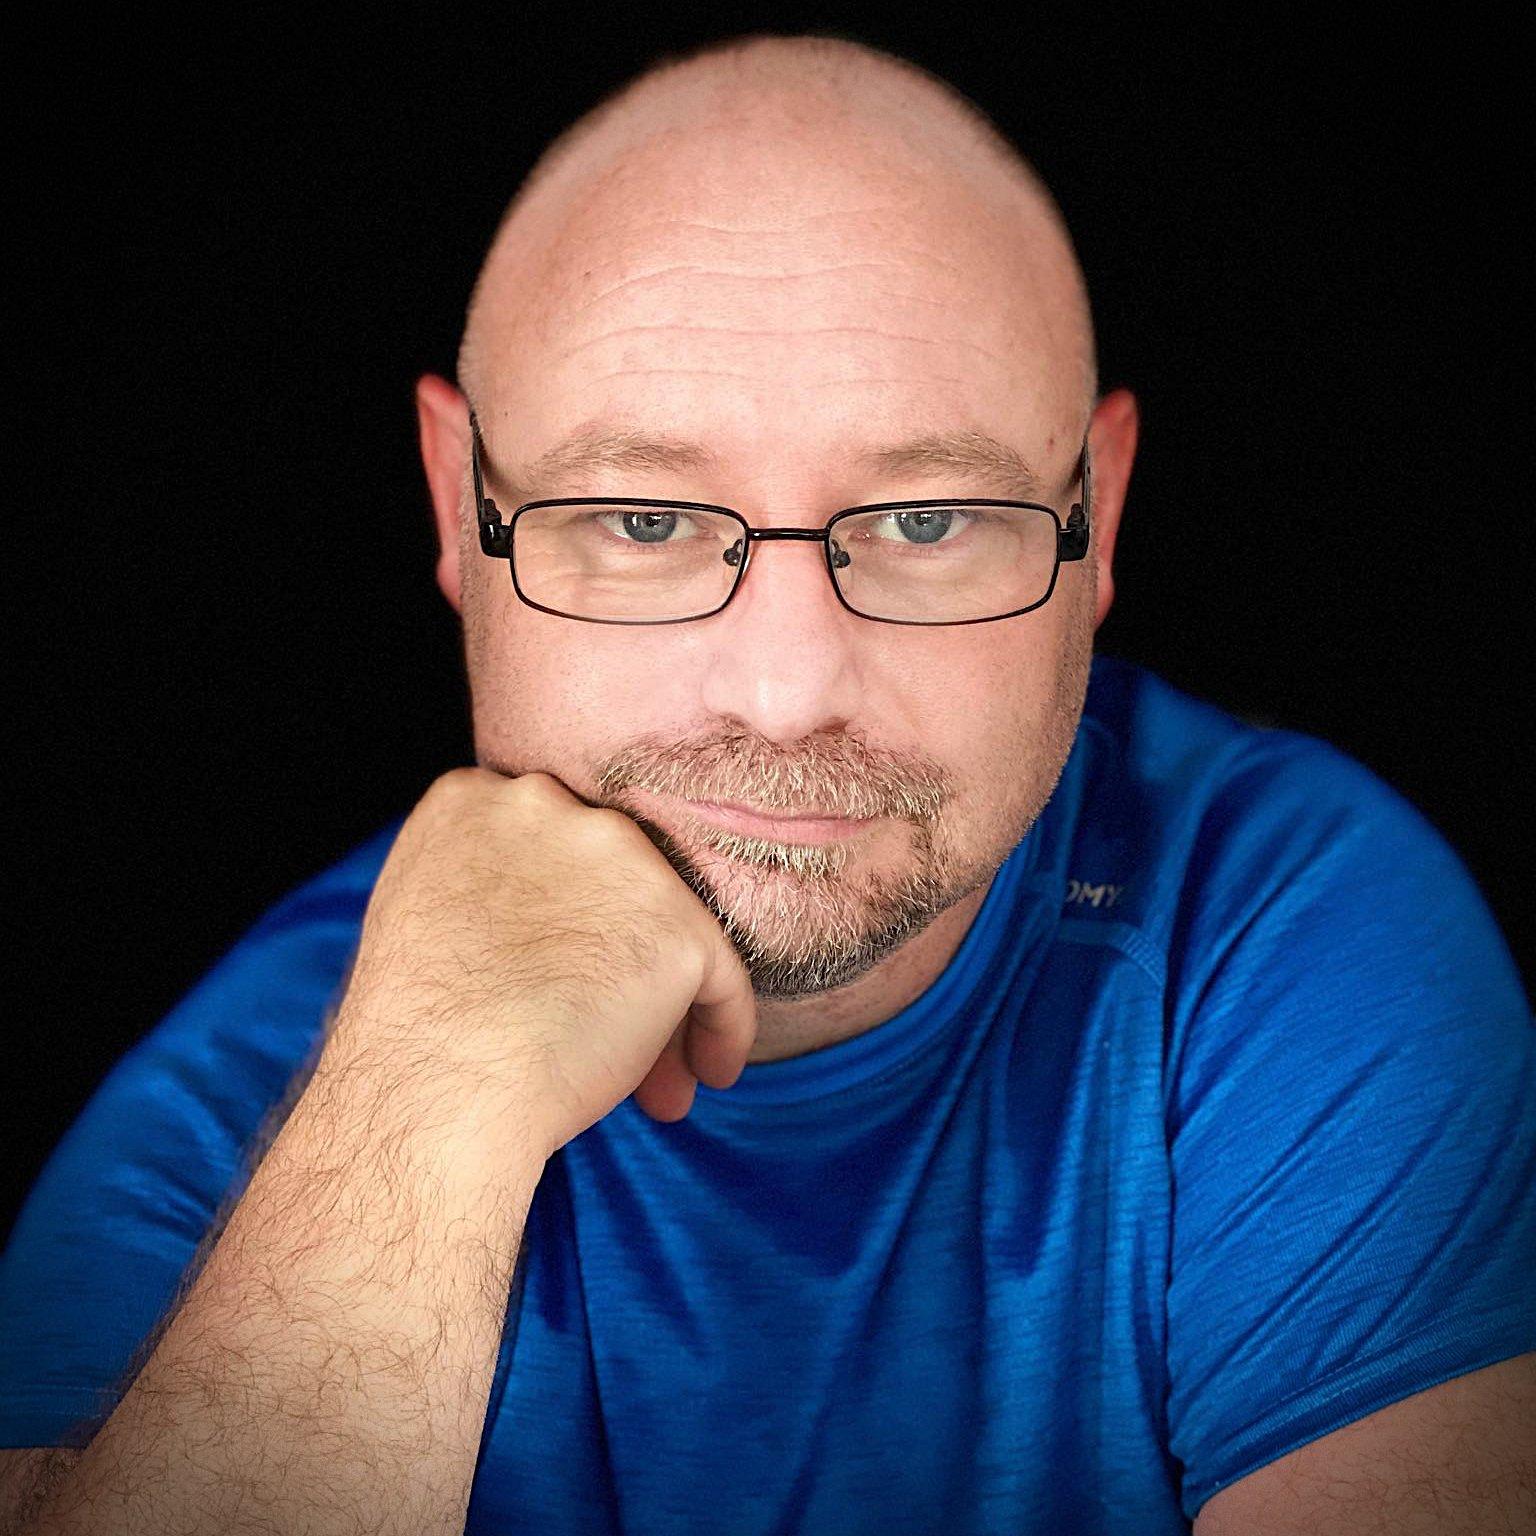 Mike Harlington